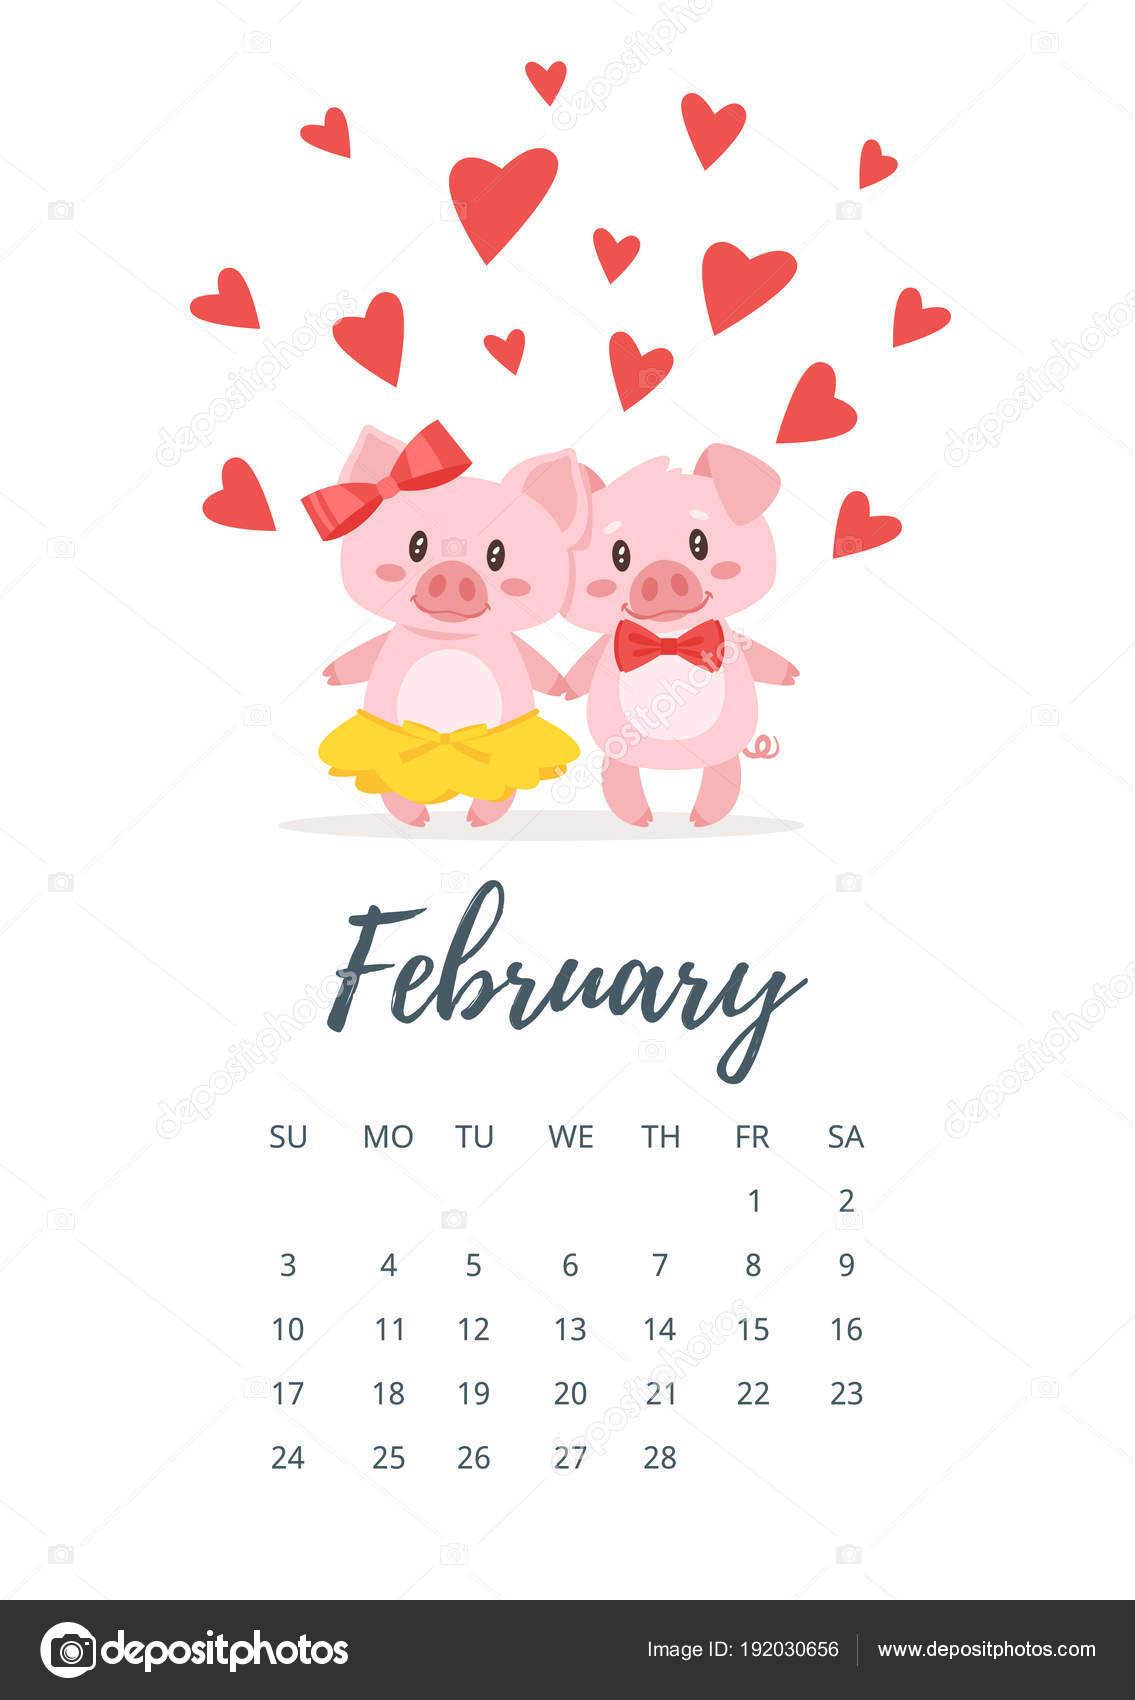 2019 naptár február Évben 2019 február naptár oldal — Stock Vektor © tkronalter9.gmail  2019 naptár február